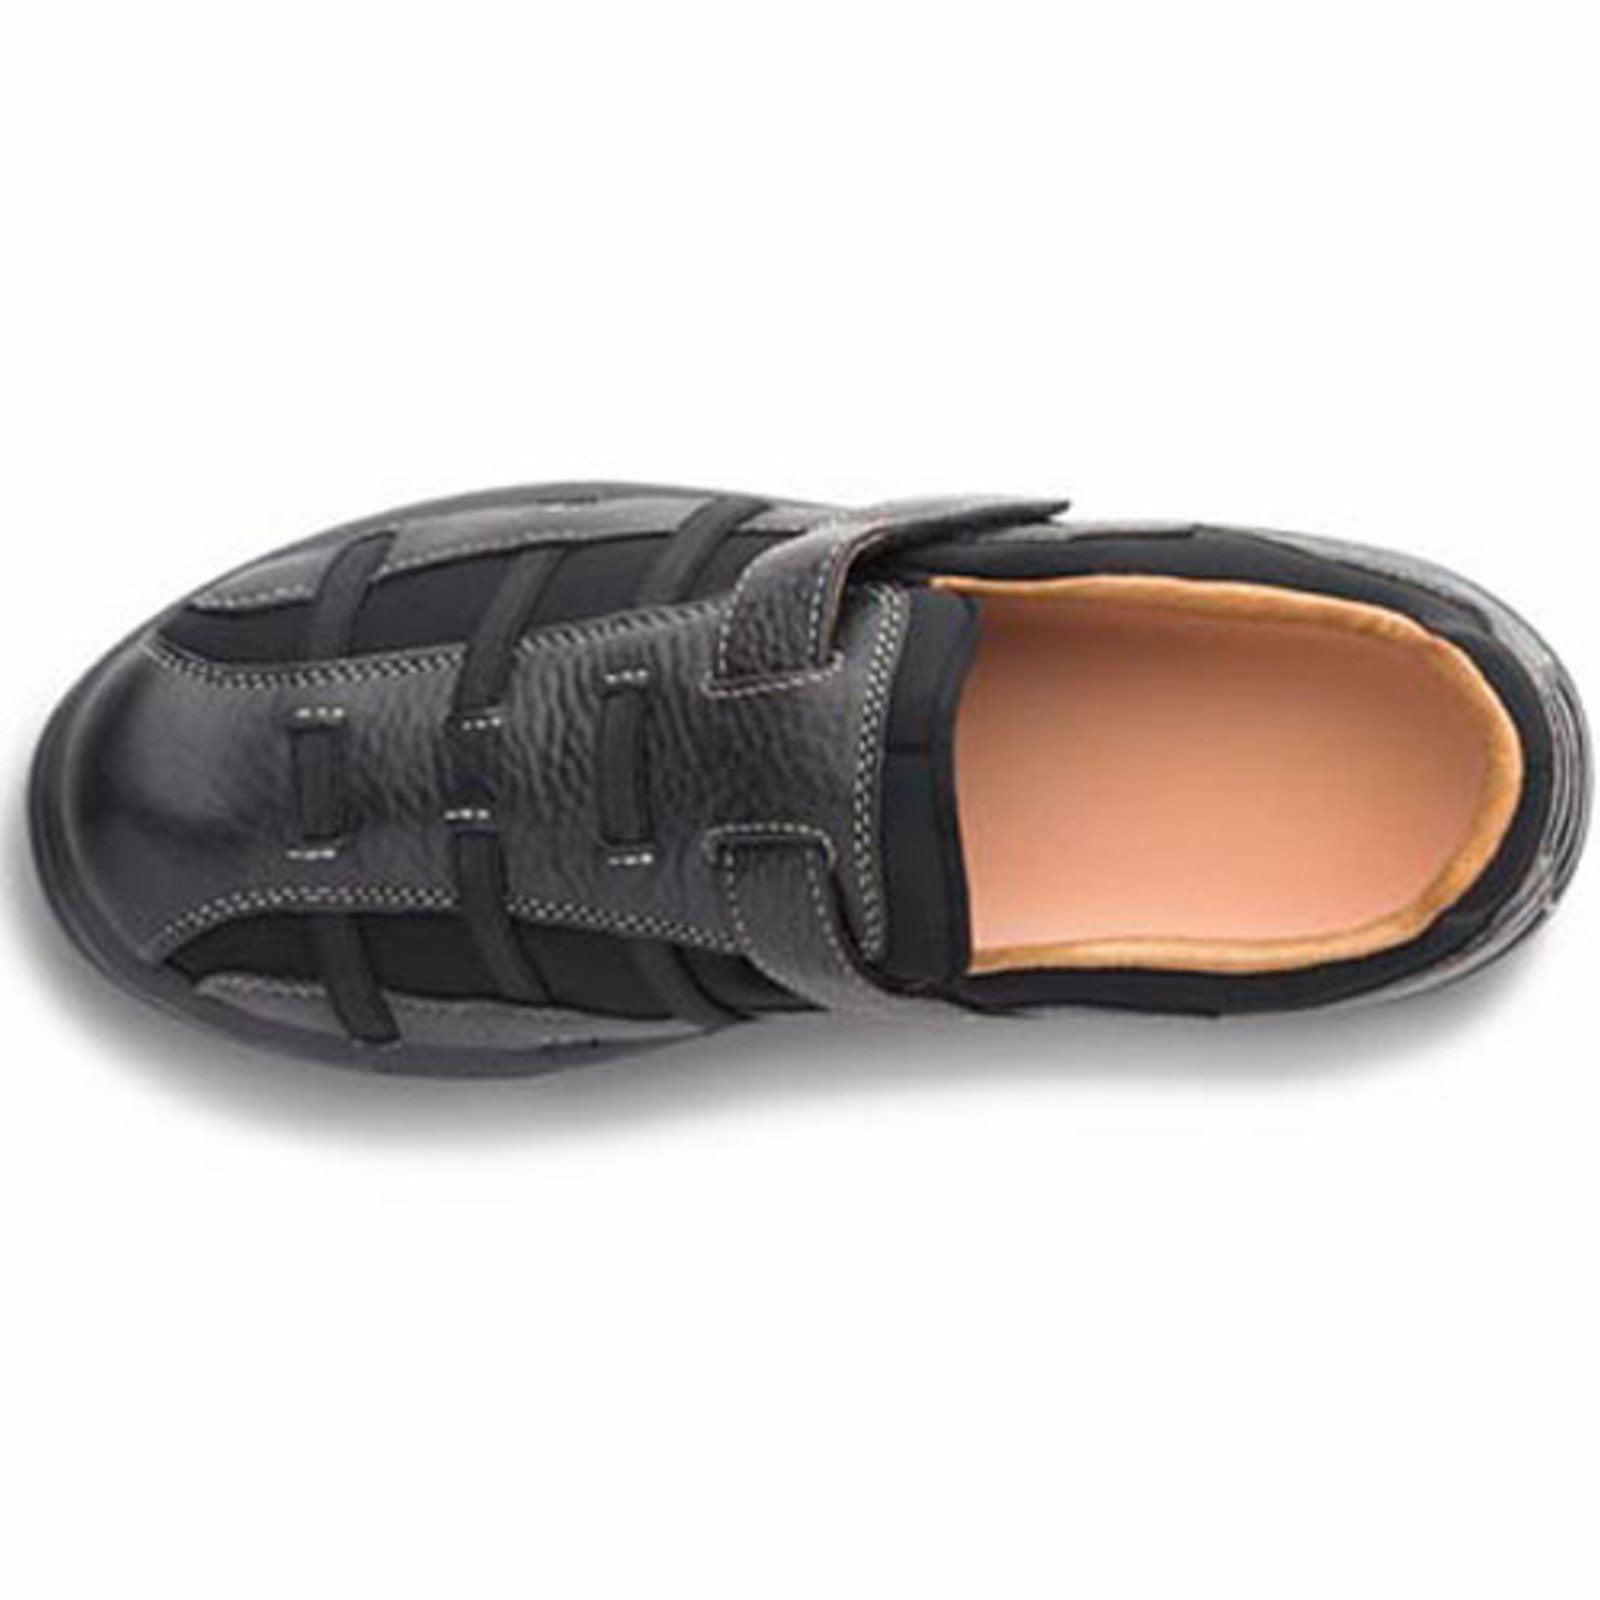 Dr. Comfort Betty Women's Casual Sandal: 8.5 Medium (A-B) Black Velcro